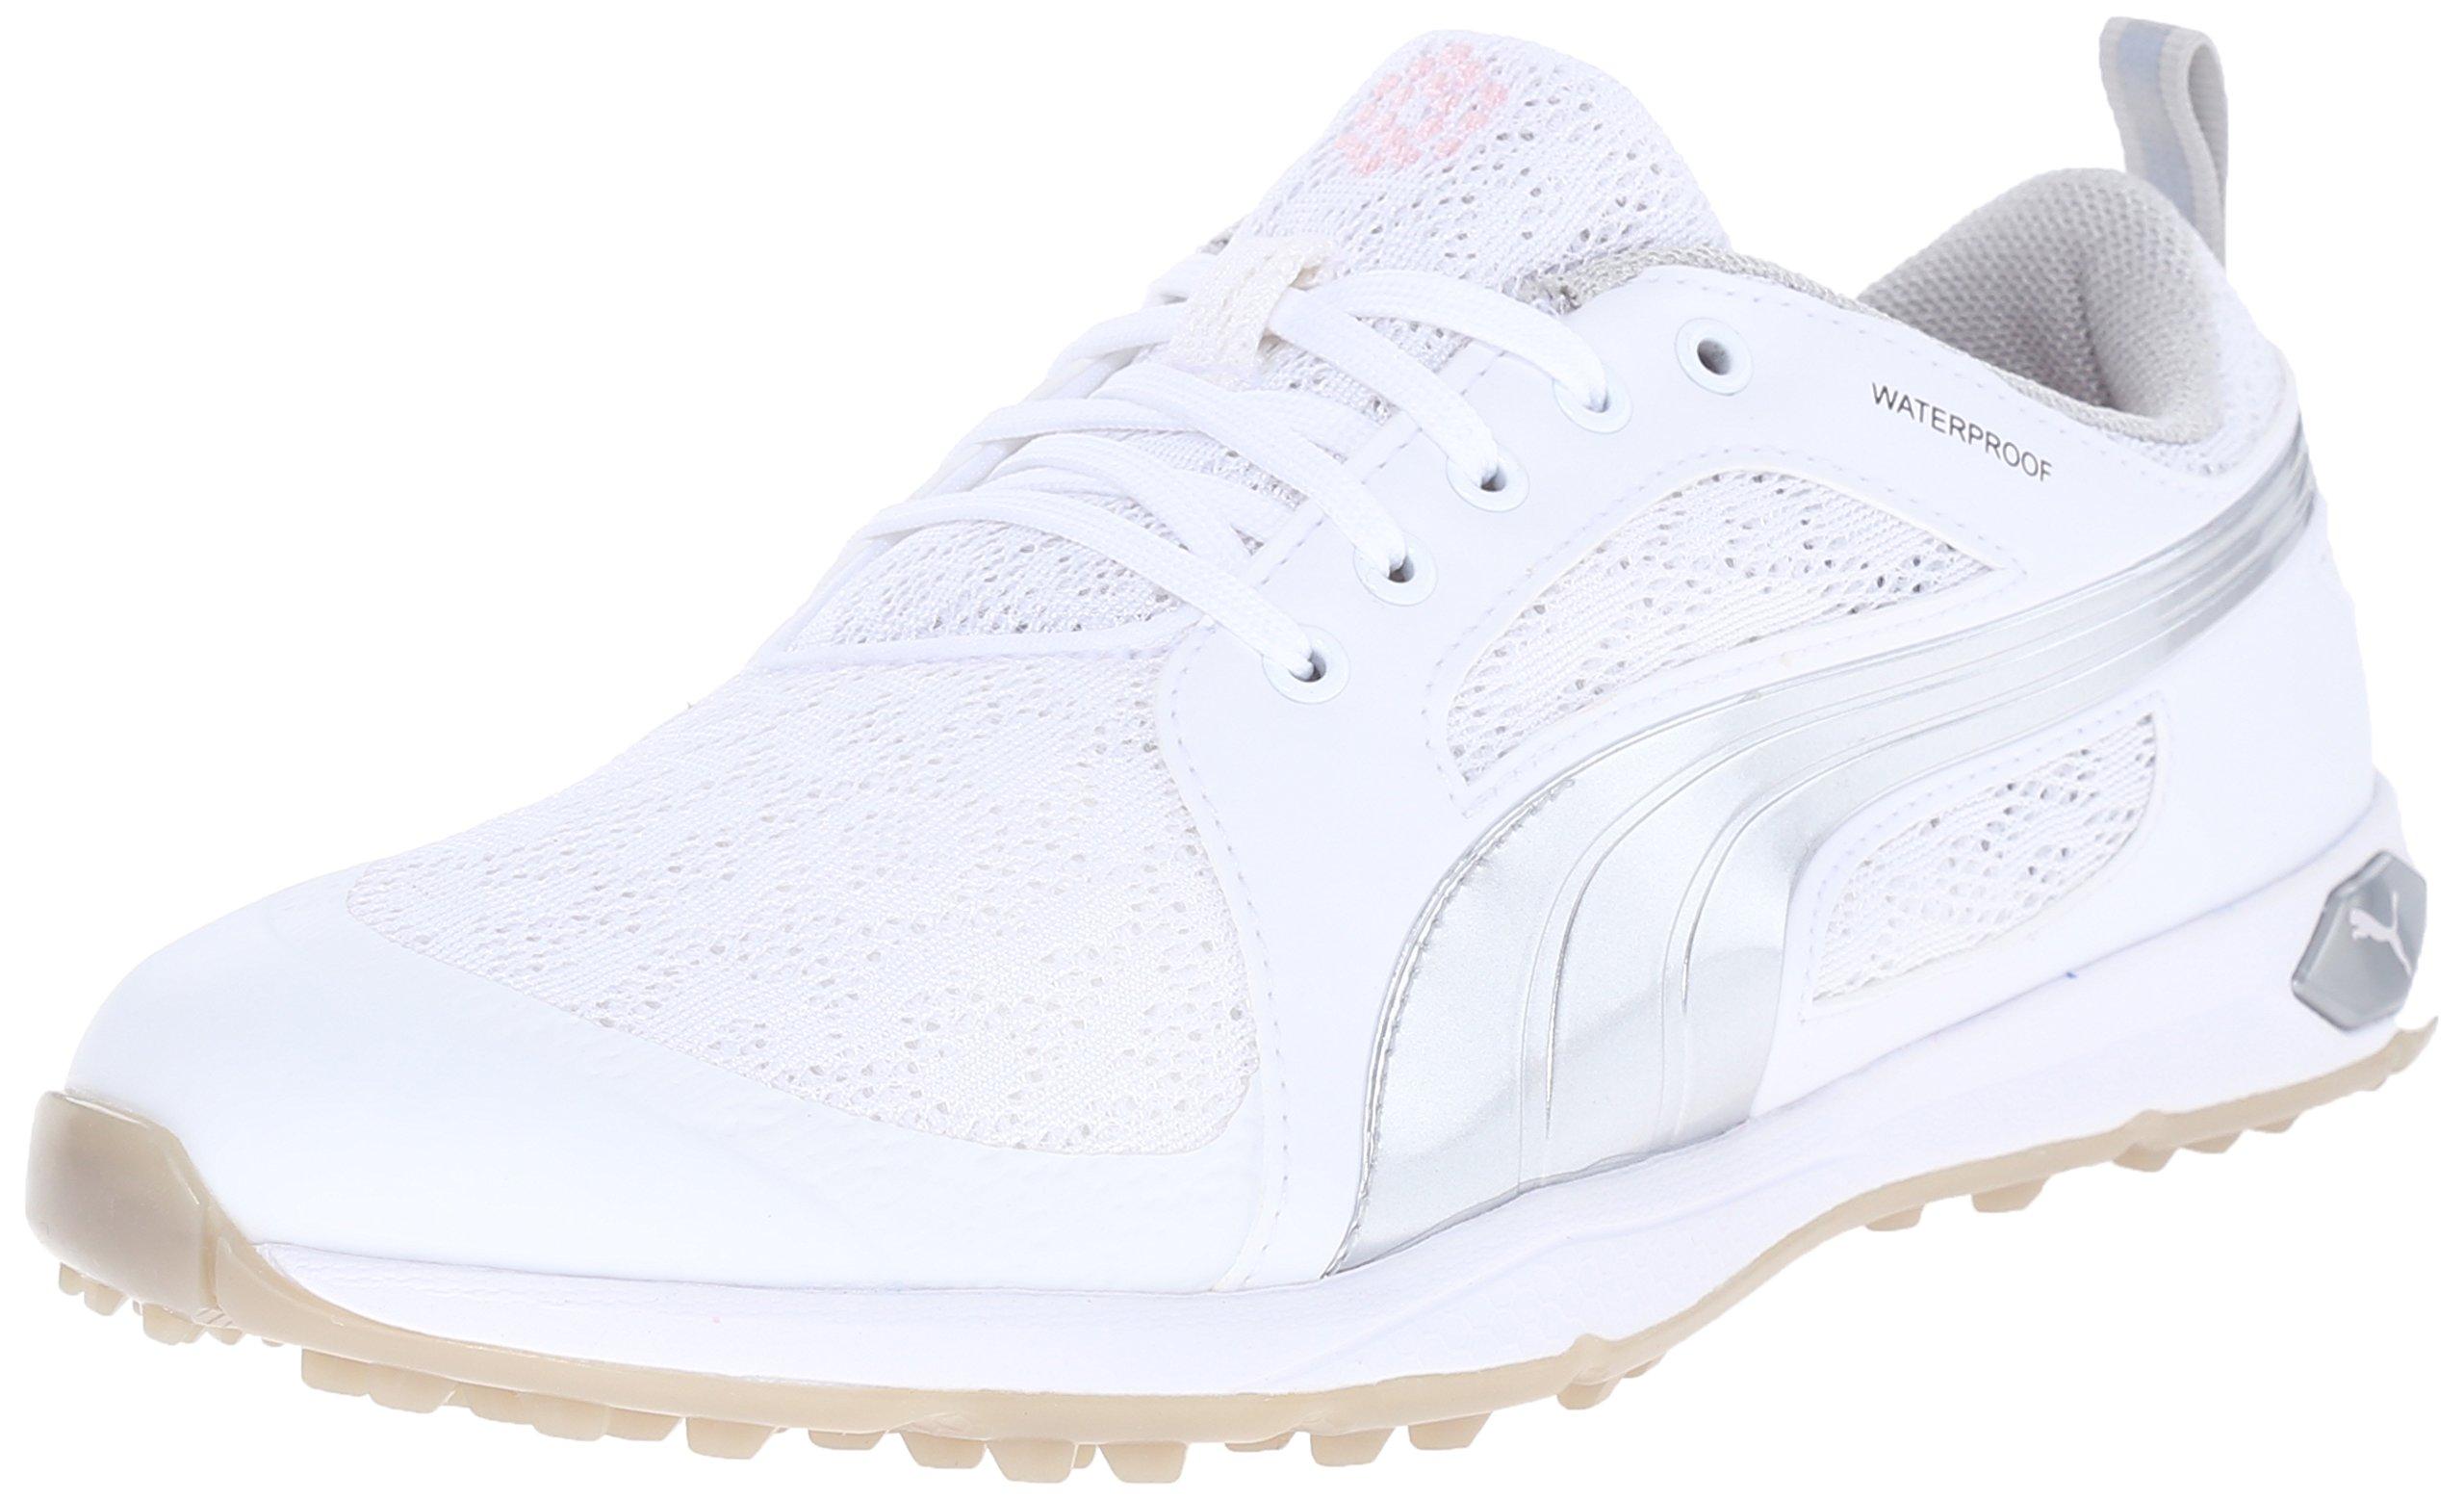 500989015a2ff2 Galleon - PUMA Women s Biofly Mesh WMNS Golf Shoe White Silver